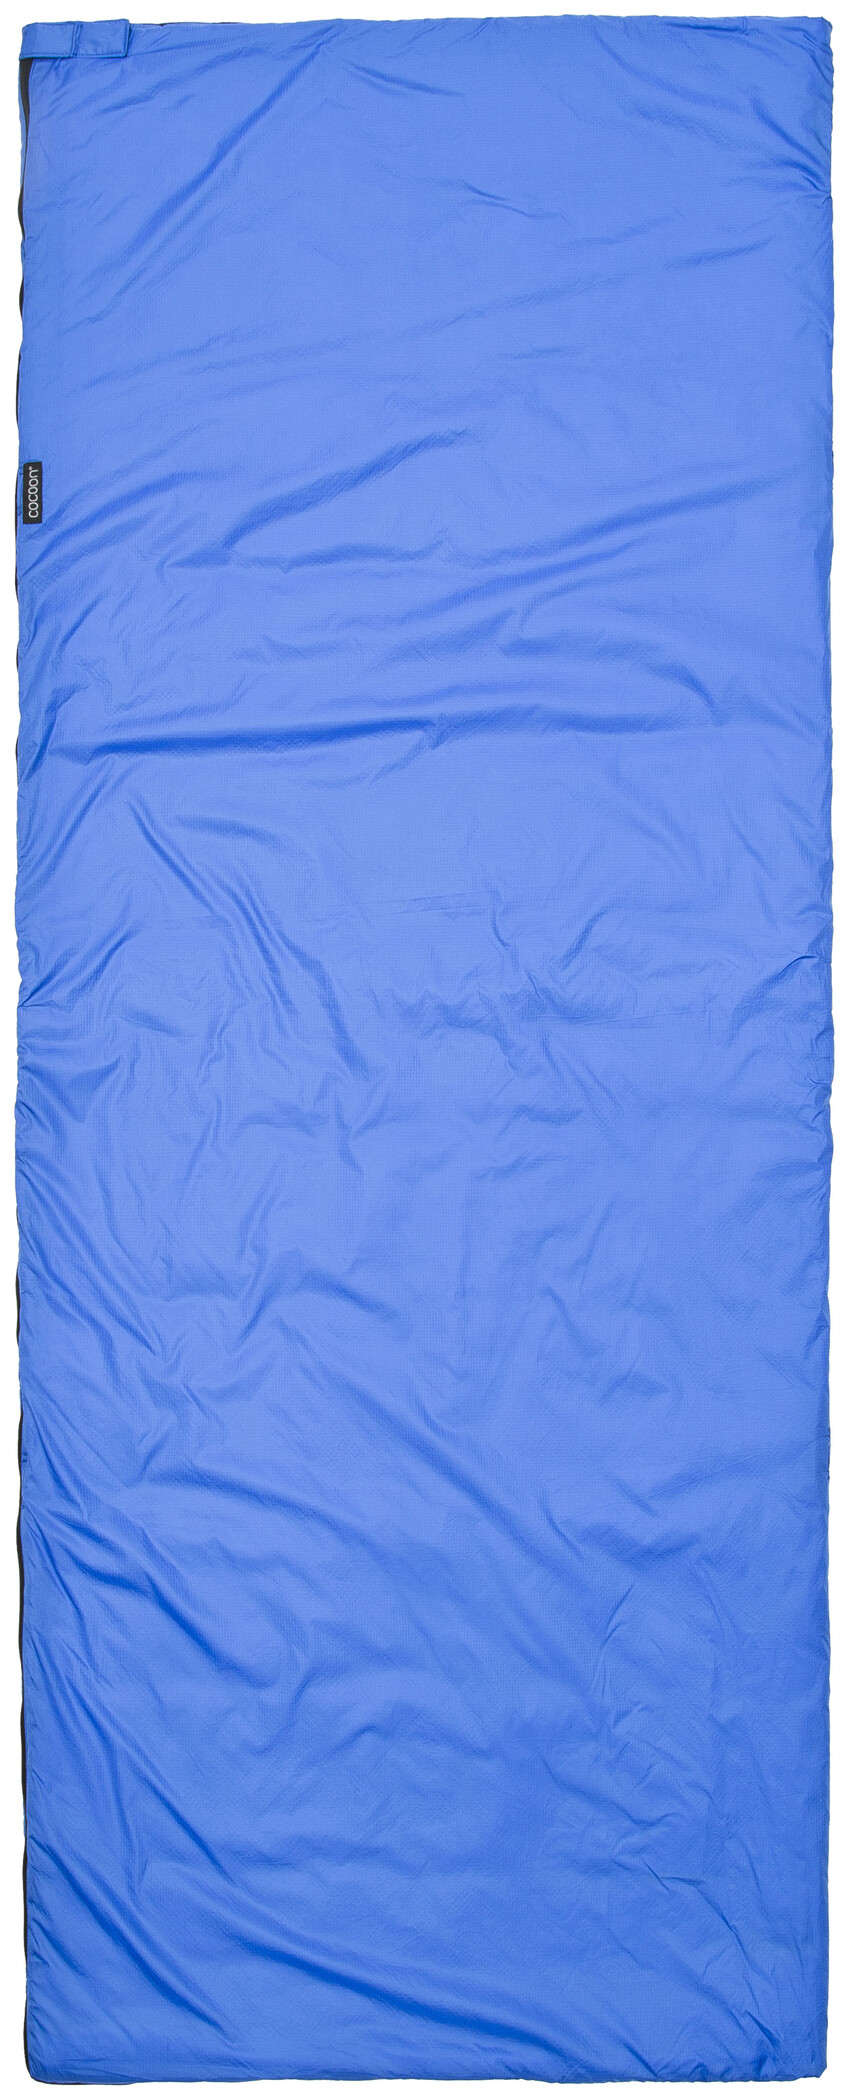 Cocoon Tropic Traveler Sovepose Silk Regular, royal blue/tuareg (2019) | Misc. Transportation and Storage